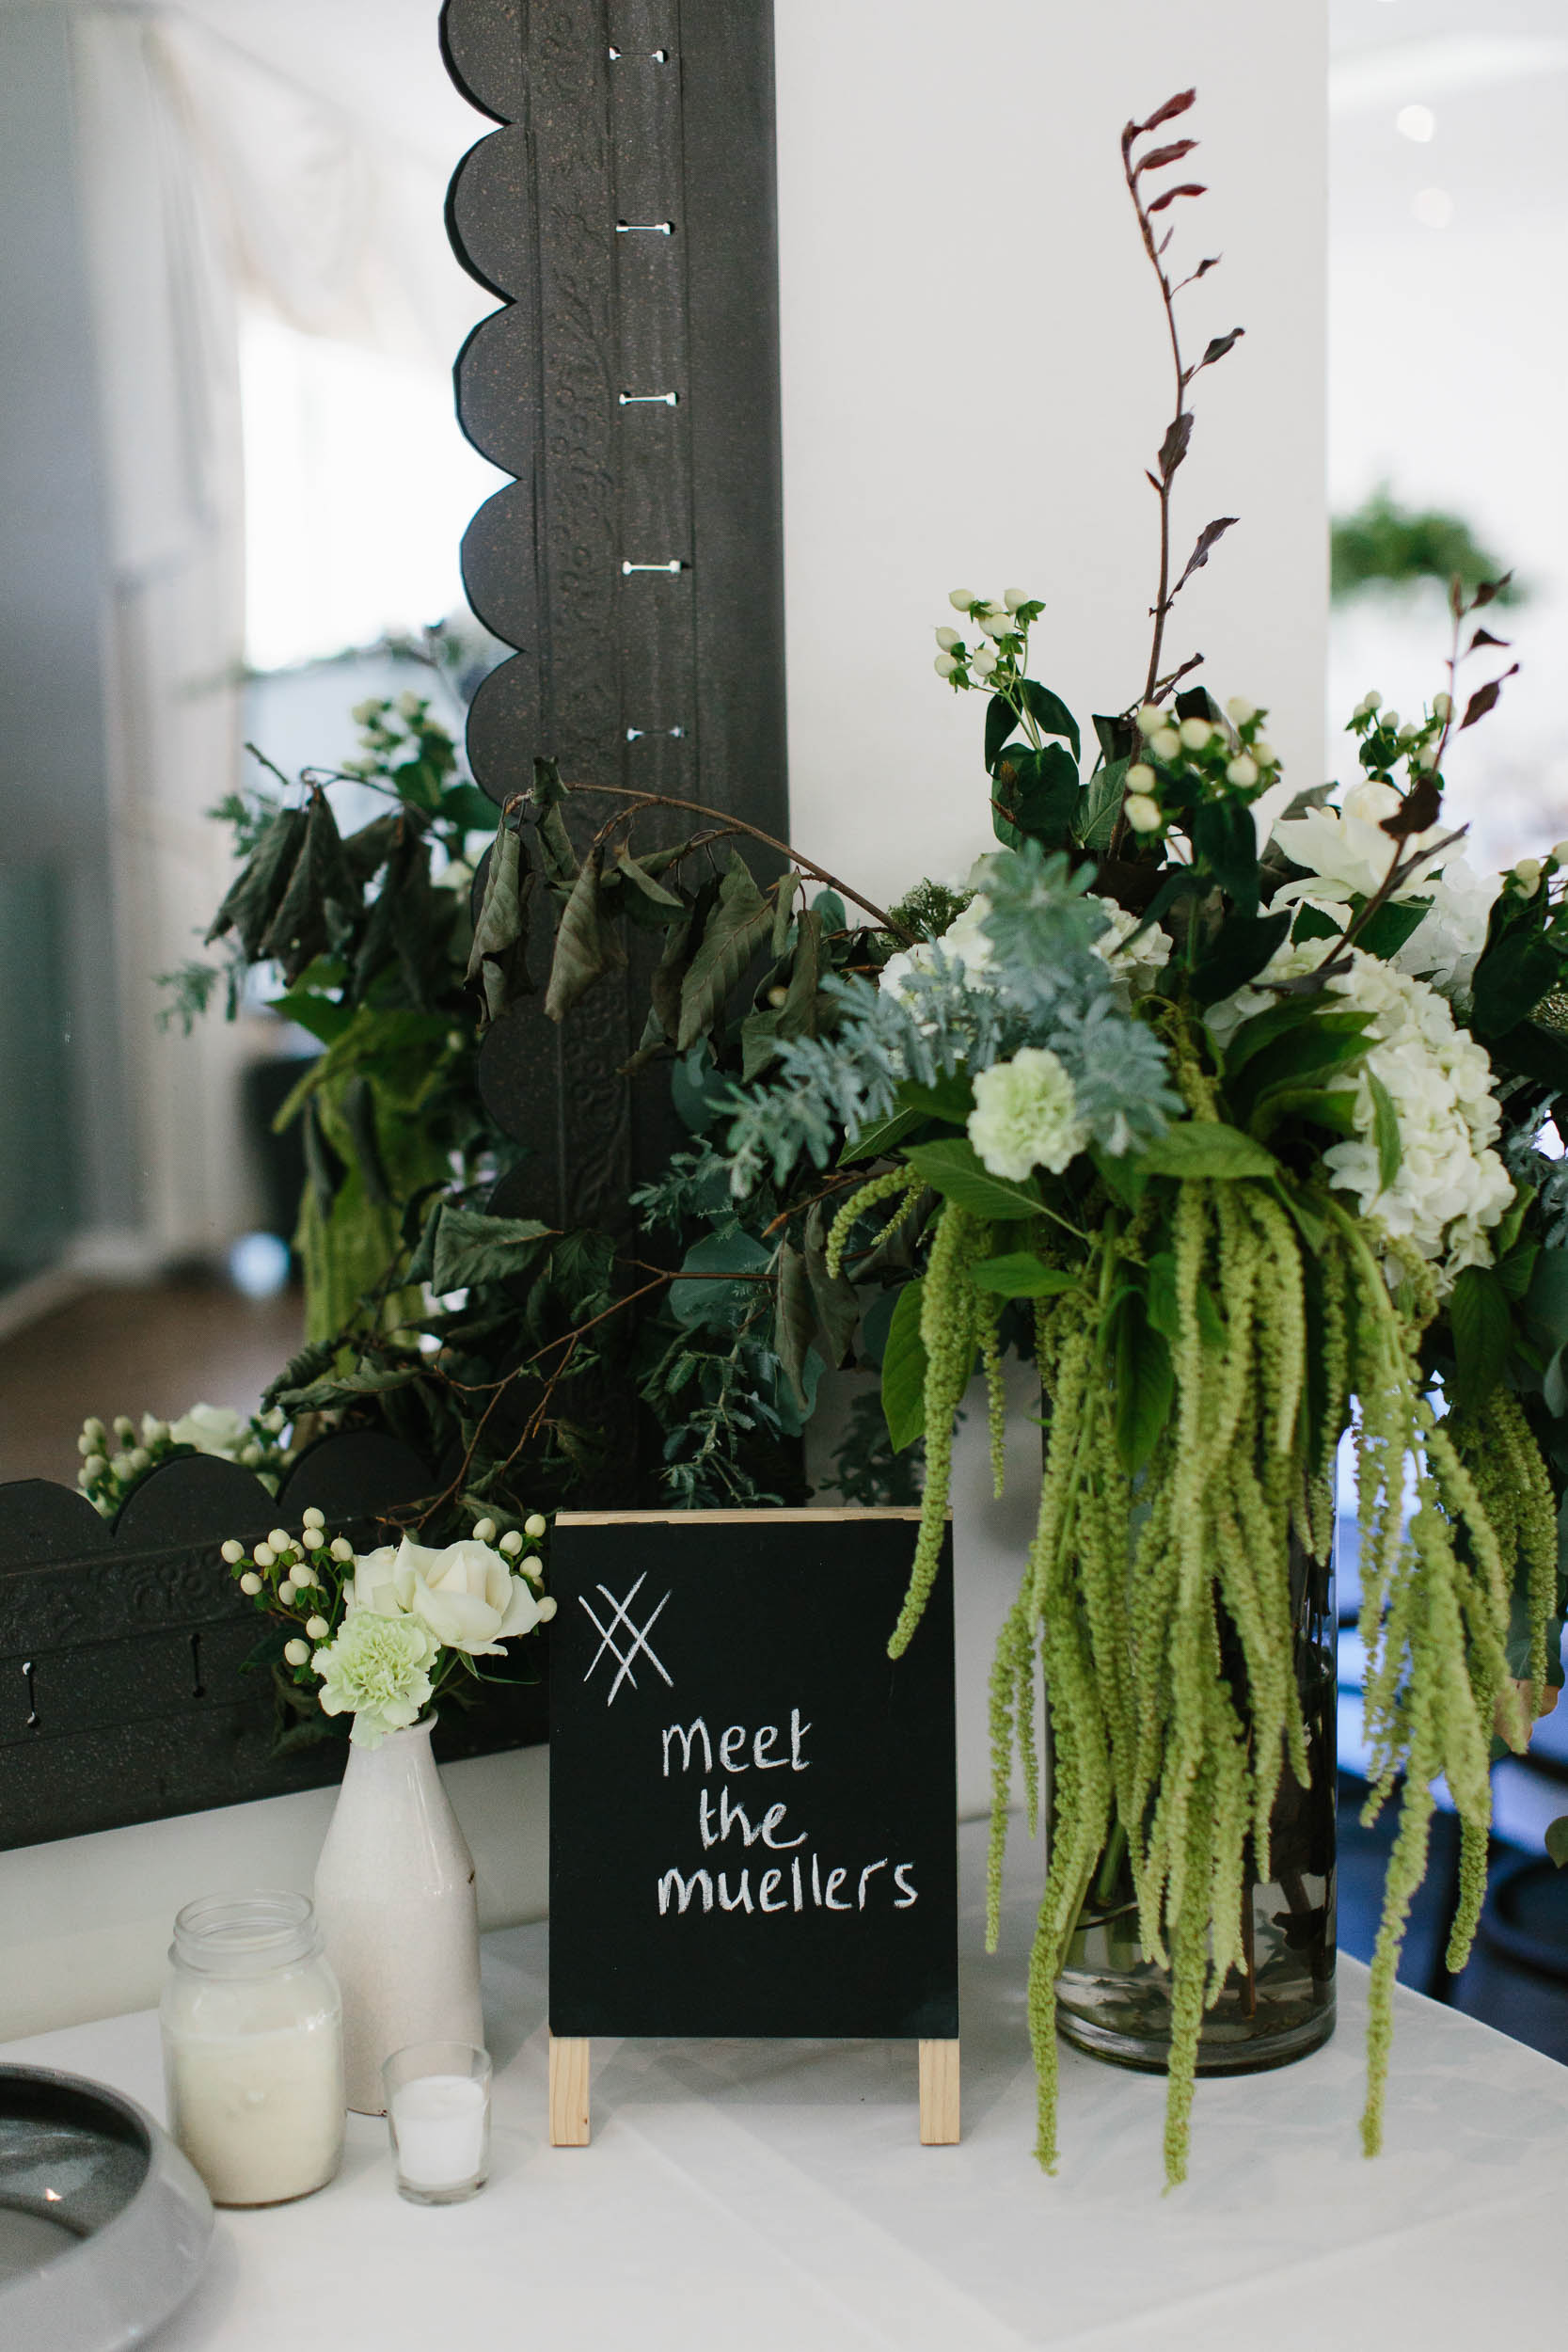 Kas-Richards-Mornington-Peninsula-Wedding-Lindenderry-Red-Hill-150.jpg